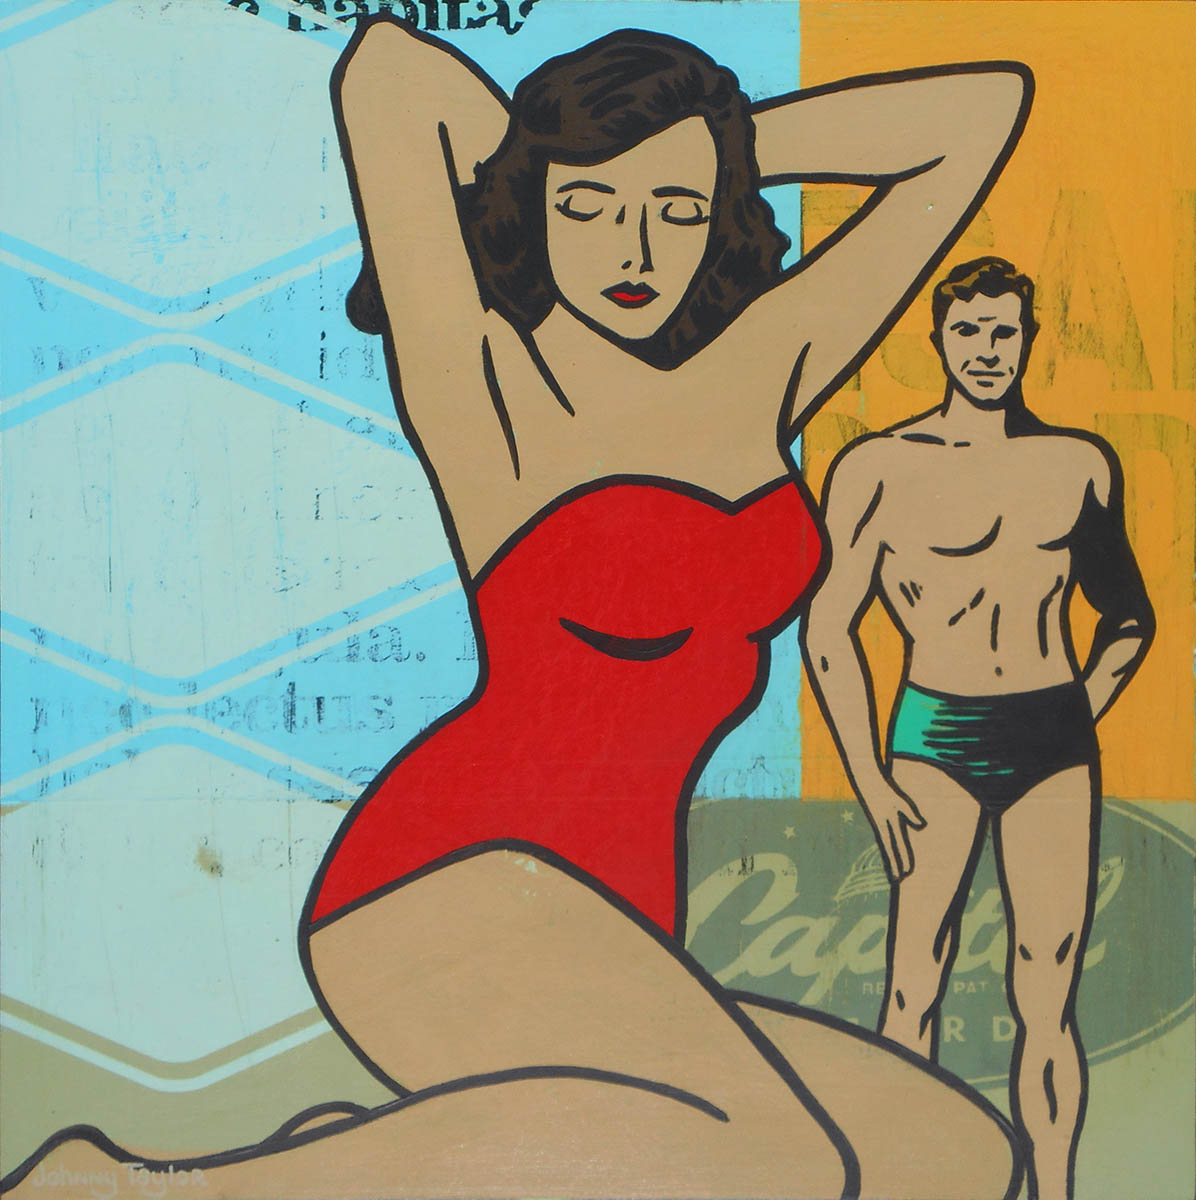 Retro couple on the beach pop art by Johnny Taylor